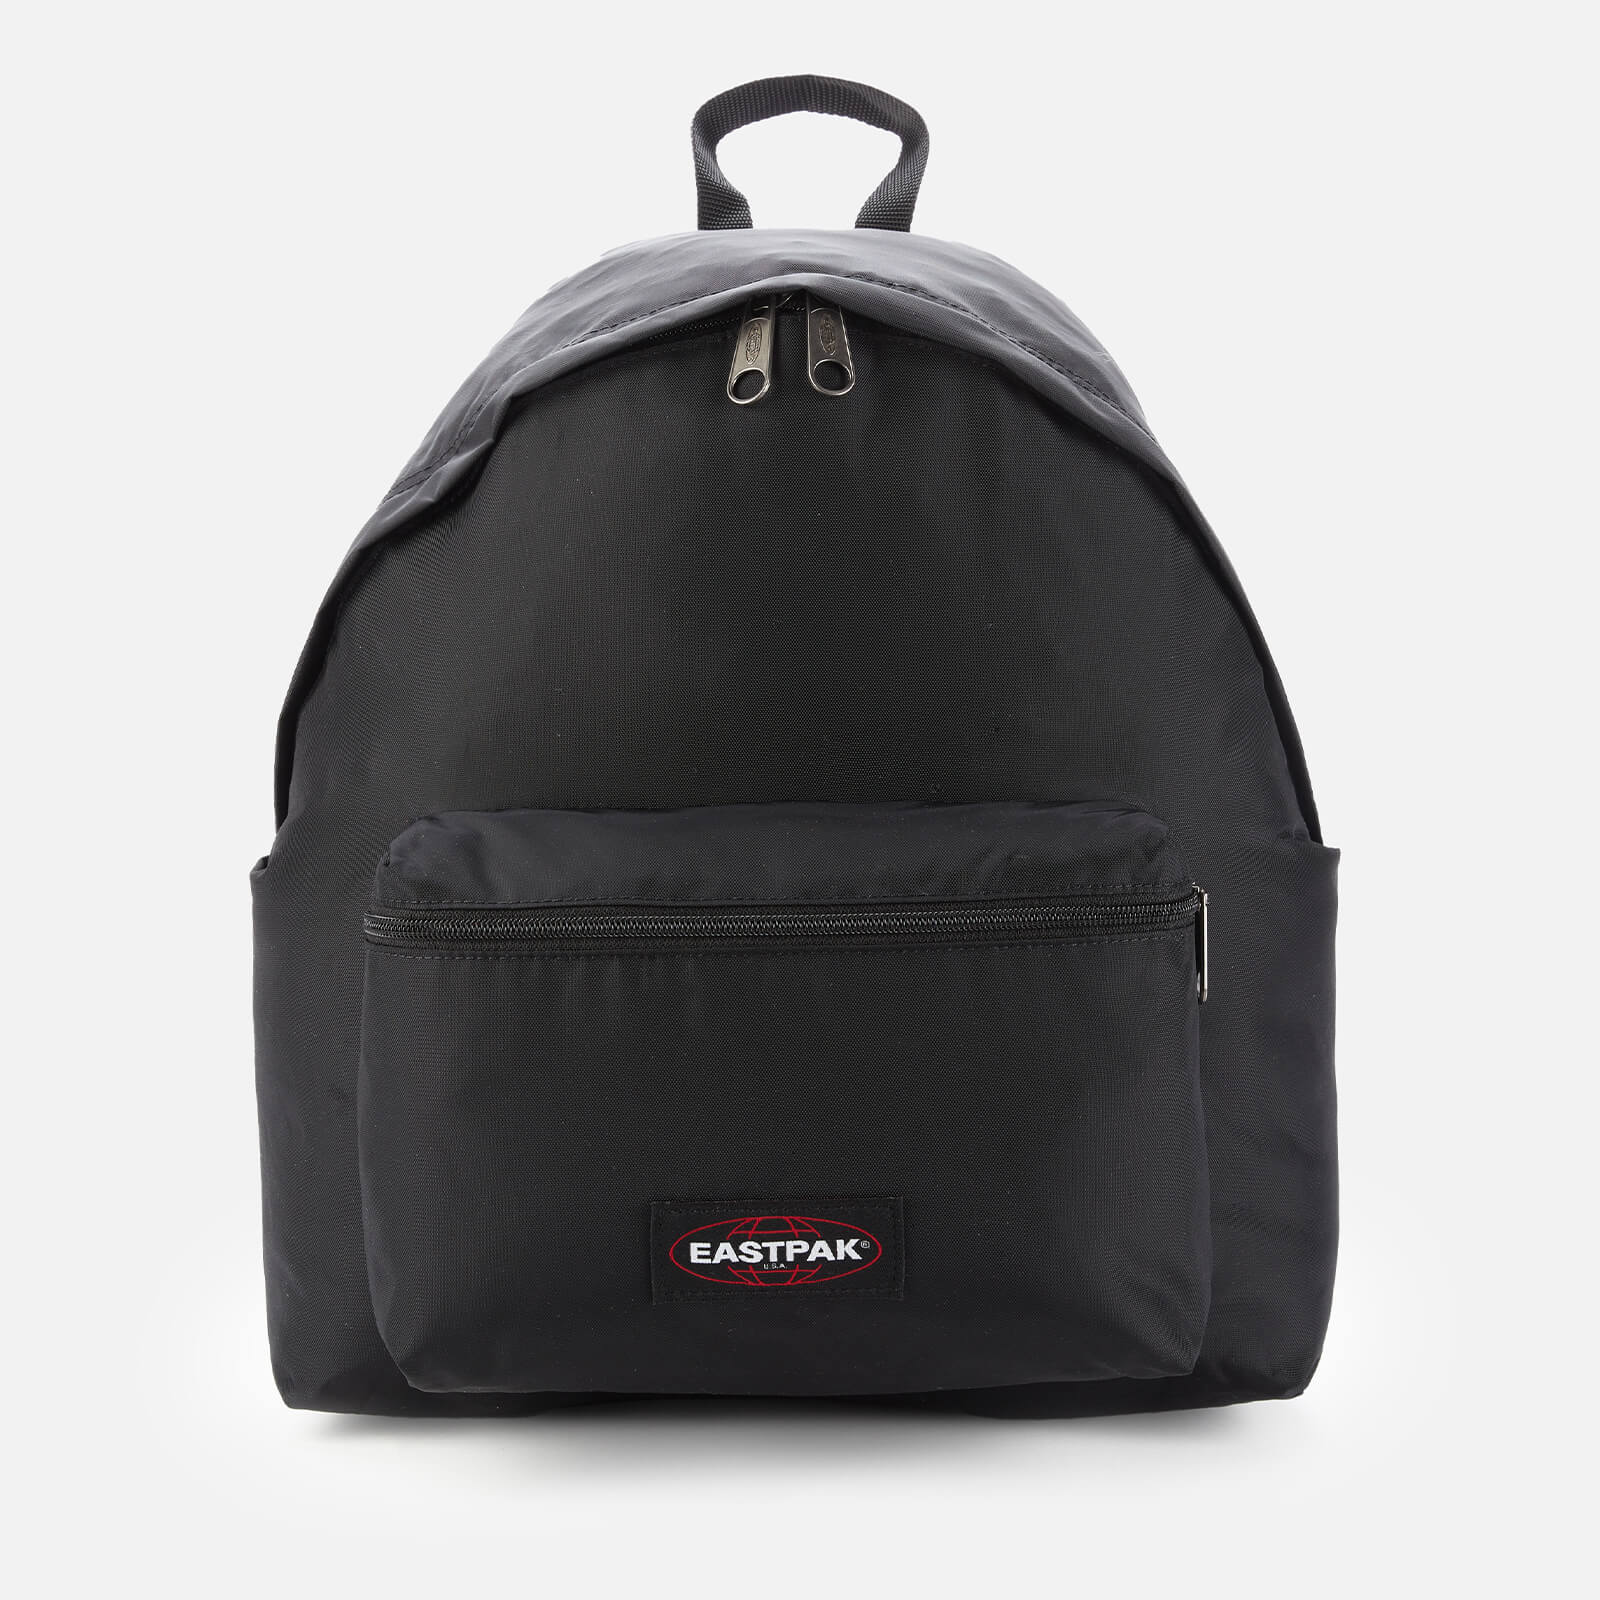 Eastpak Men's Padded Instant Backpack - Instant Black